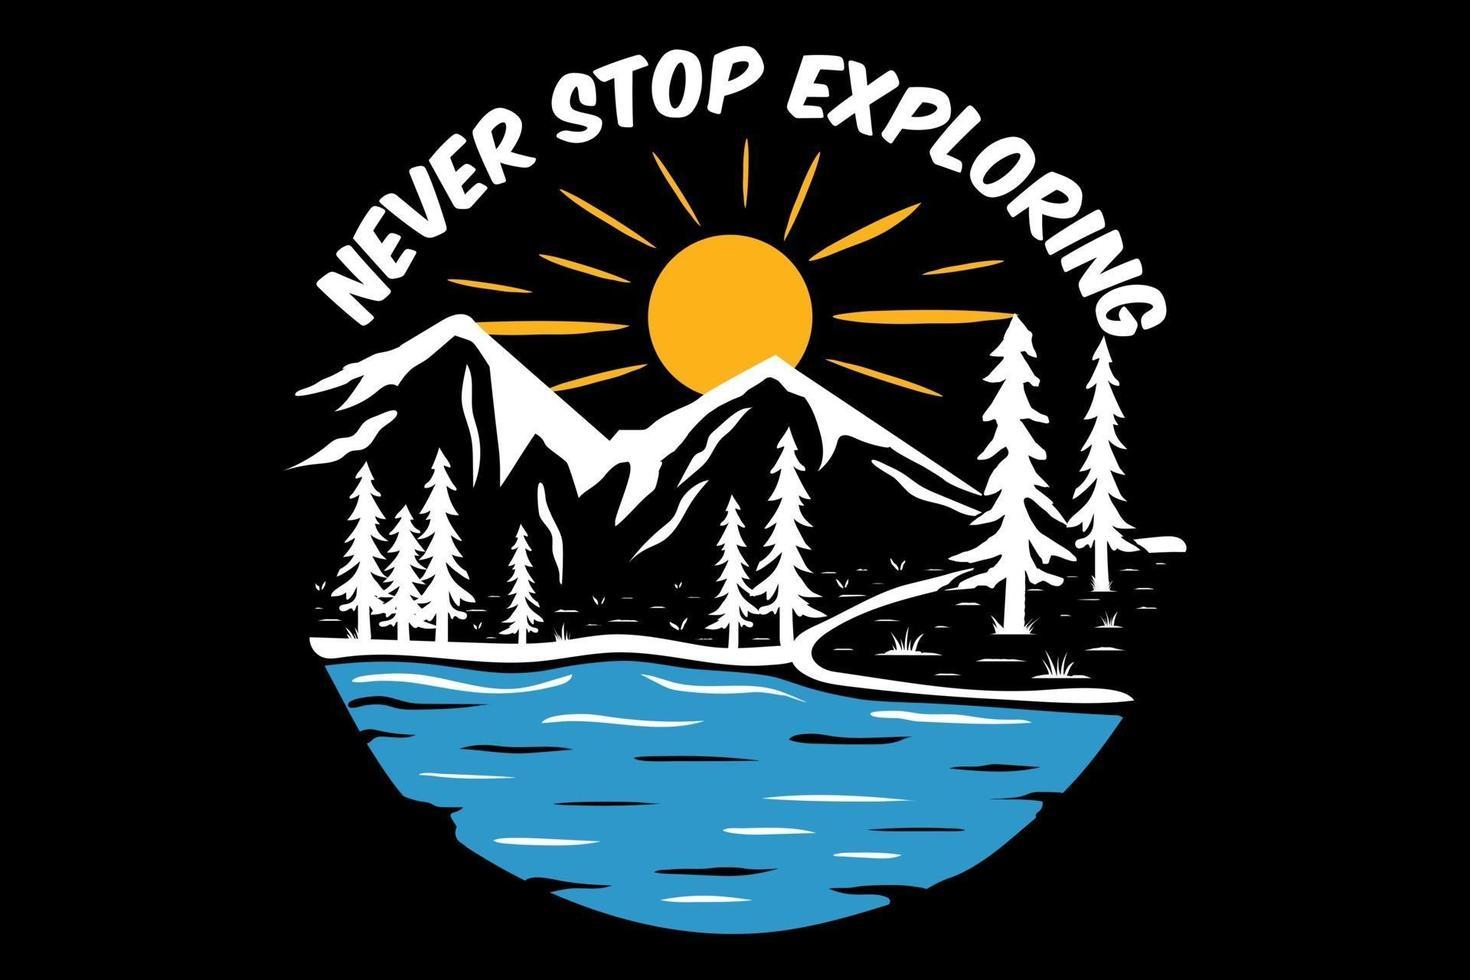 T-shirt never stop exploring nature vector